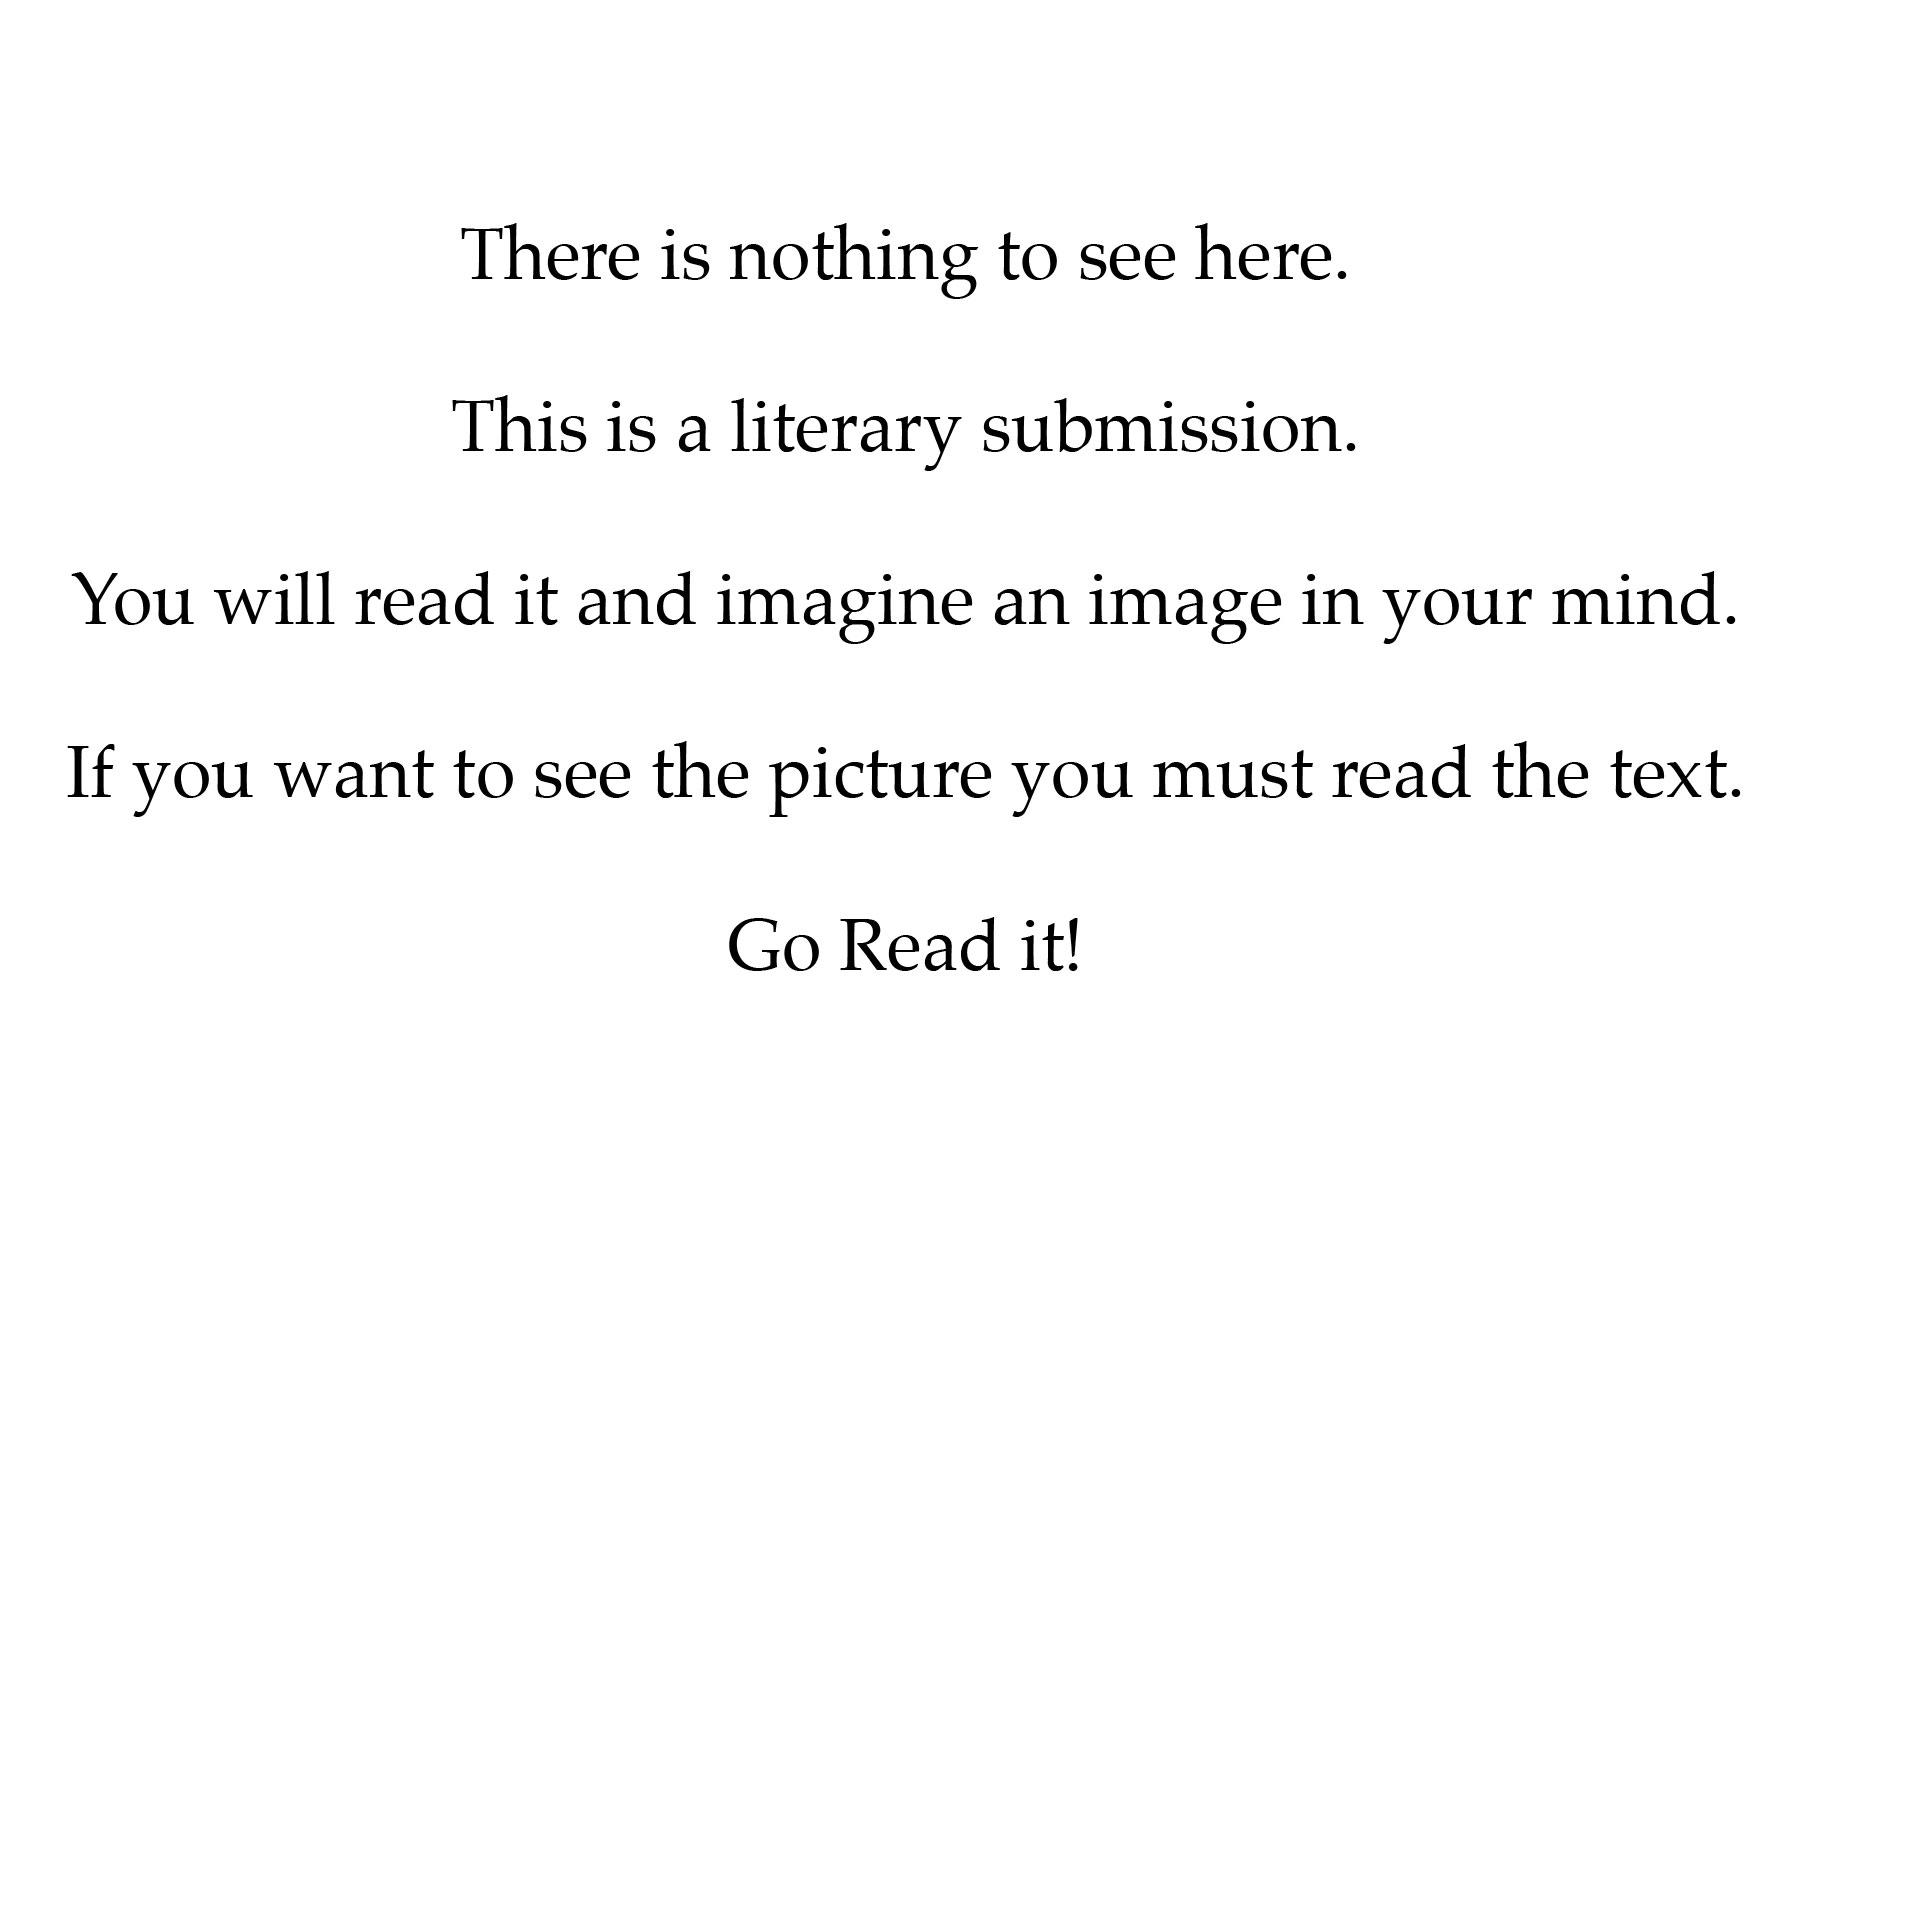 LiterarySubmission